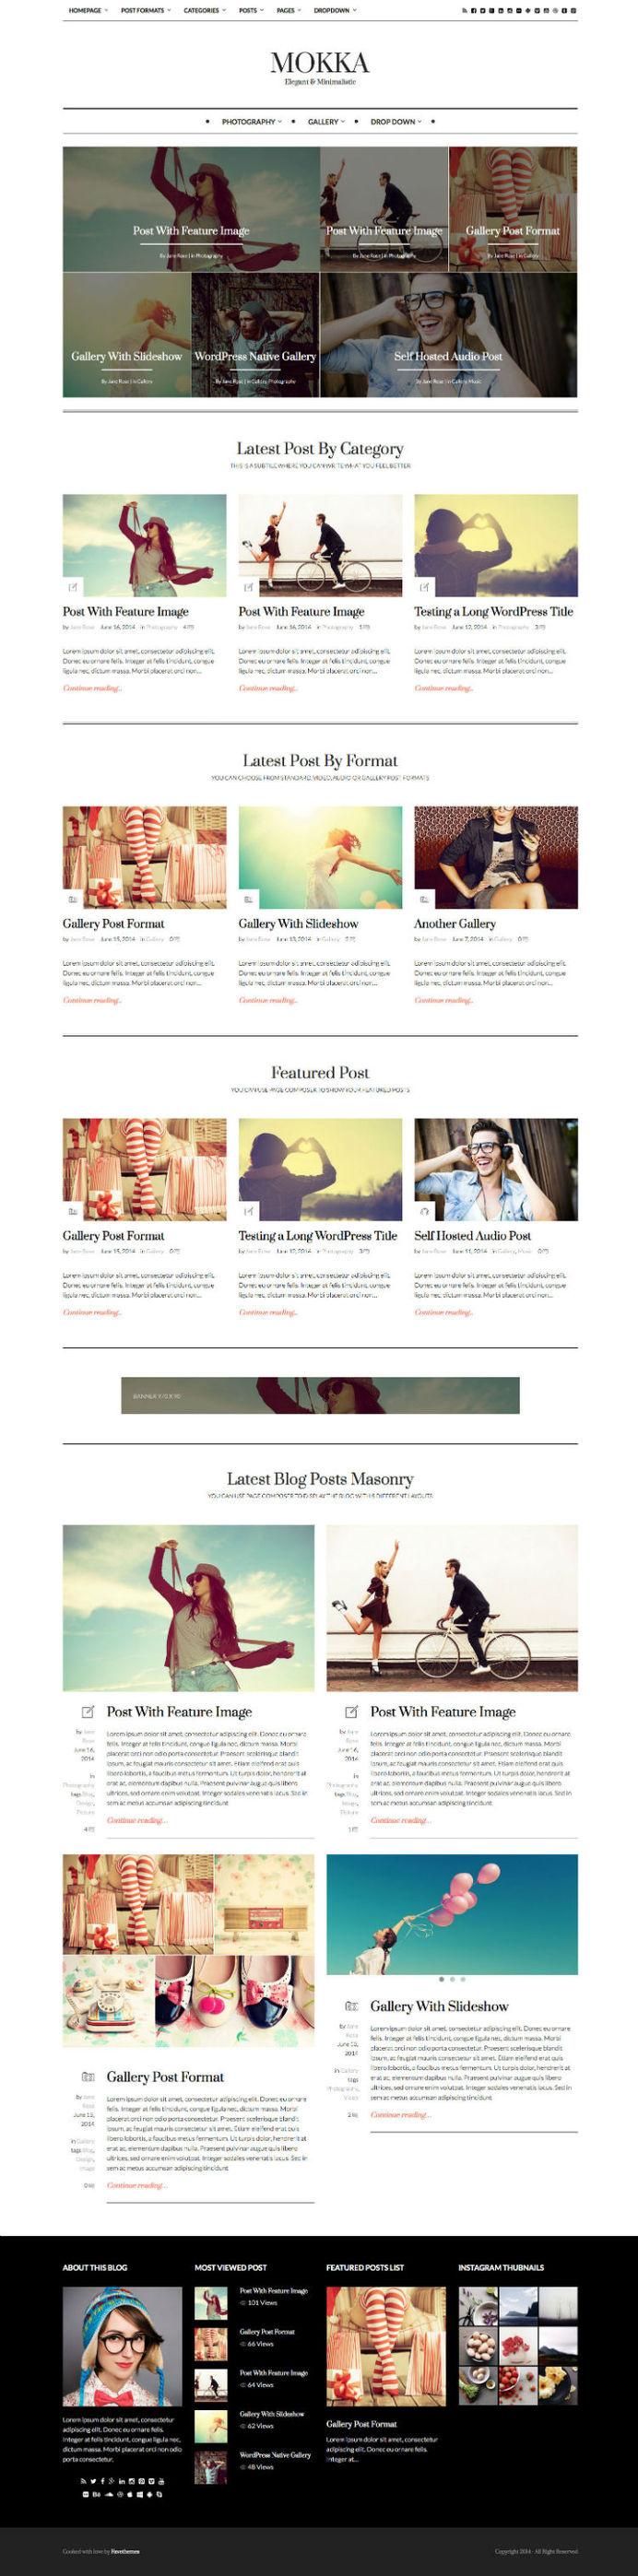 concept, layout,minimal, blog, magazine, simple, clean, web design #concept #layout #minimal #blog #magazine #simple #clean #web design